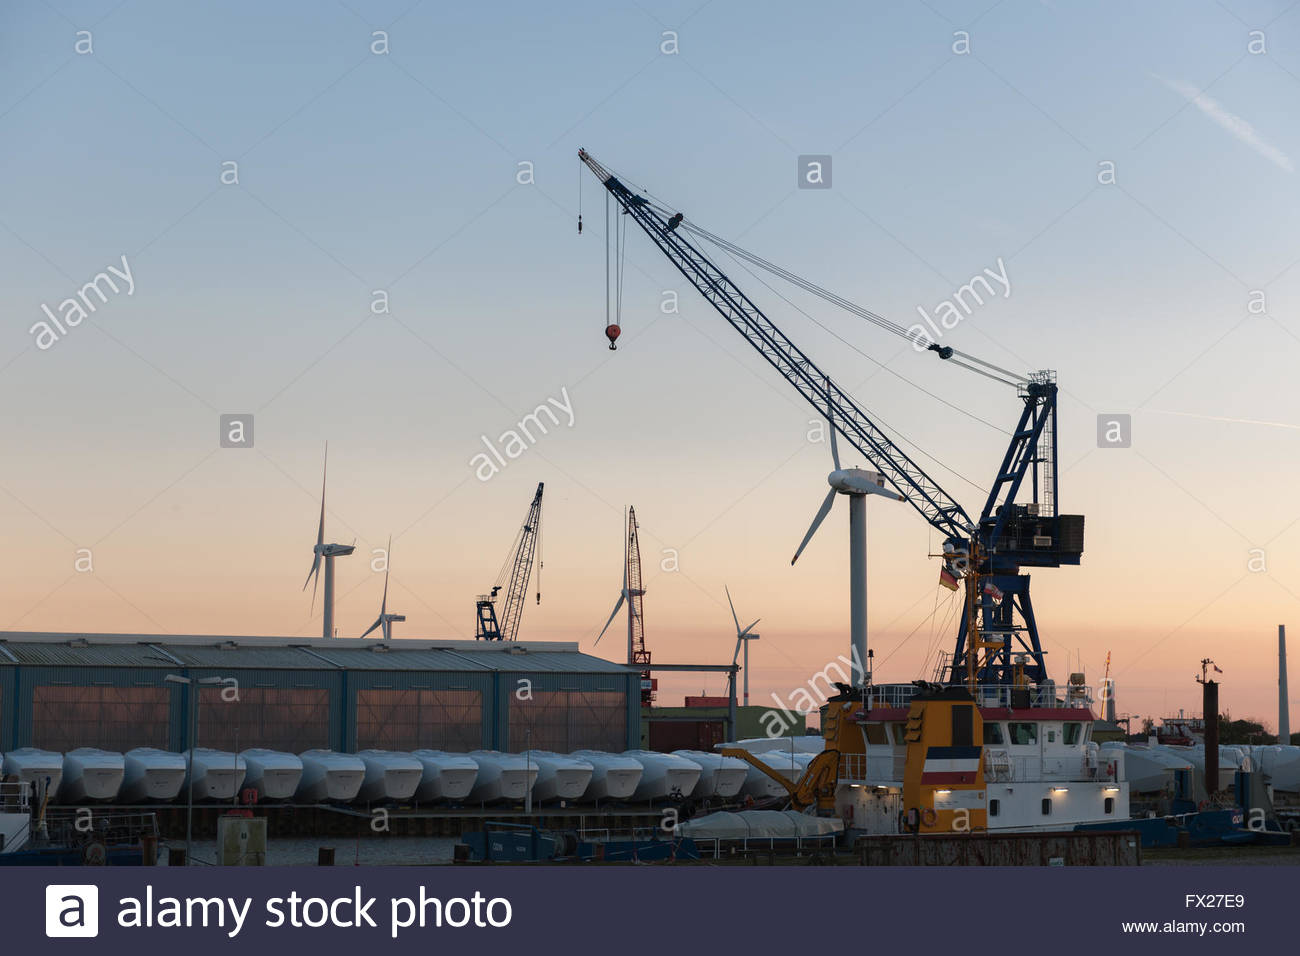 Produzione di impianti a energia eolica, Husum, Nordfriesland, Schleswig-Holstein, Germania Immagini Stock